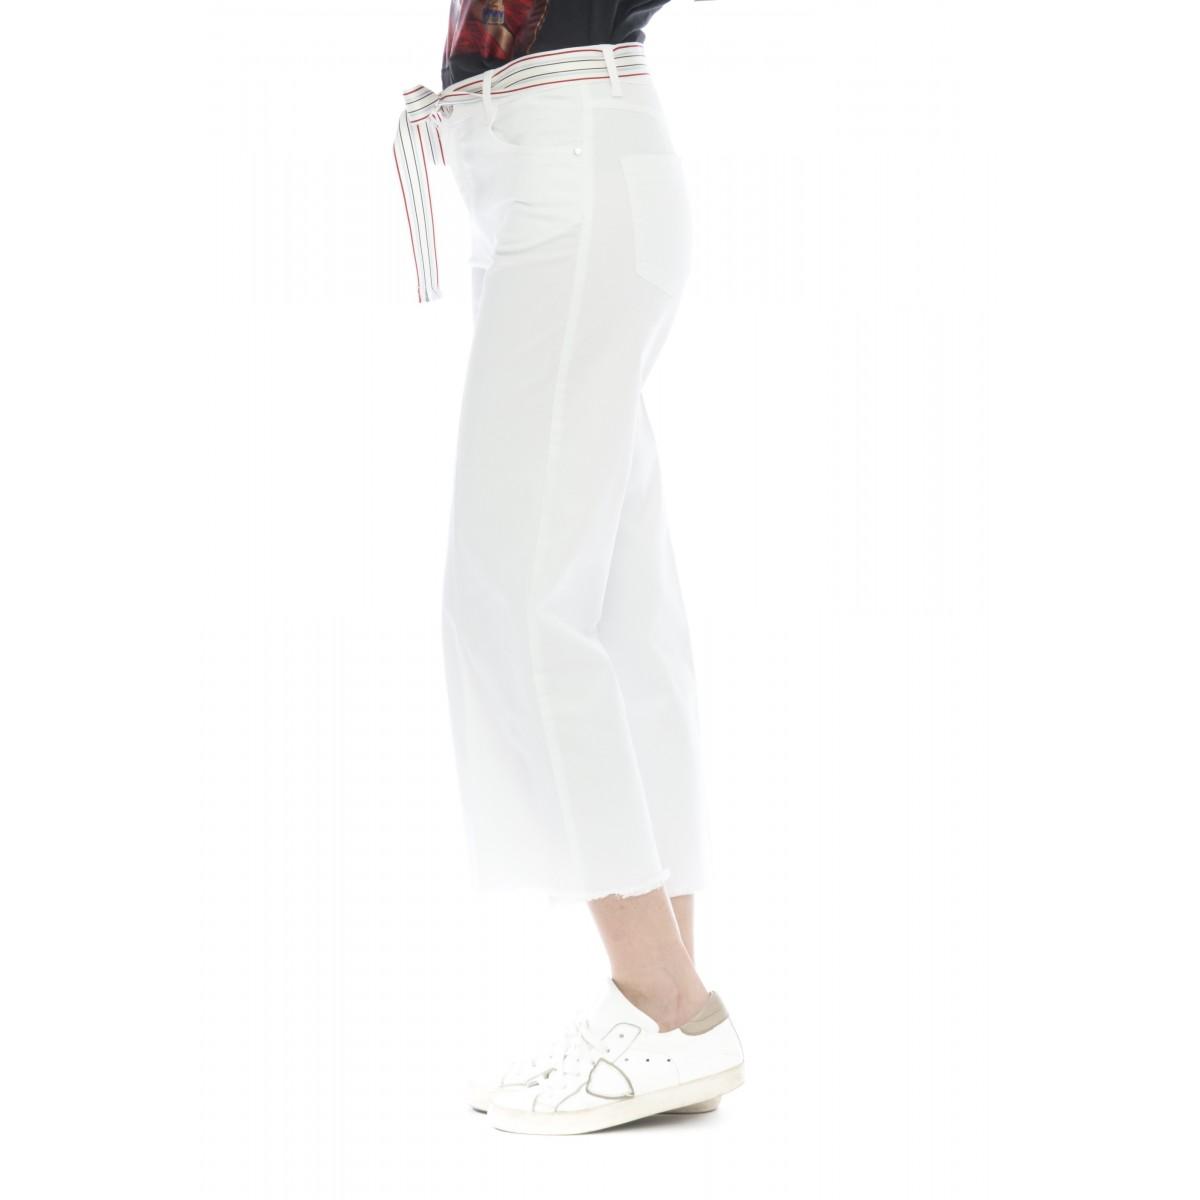 Jeans - Lira jeans bianco